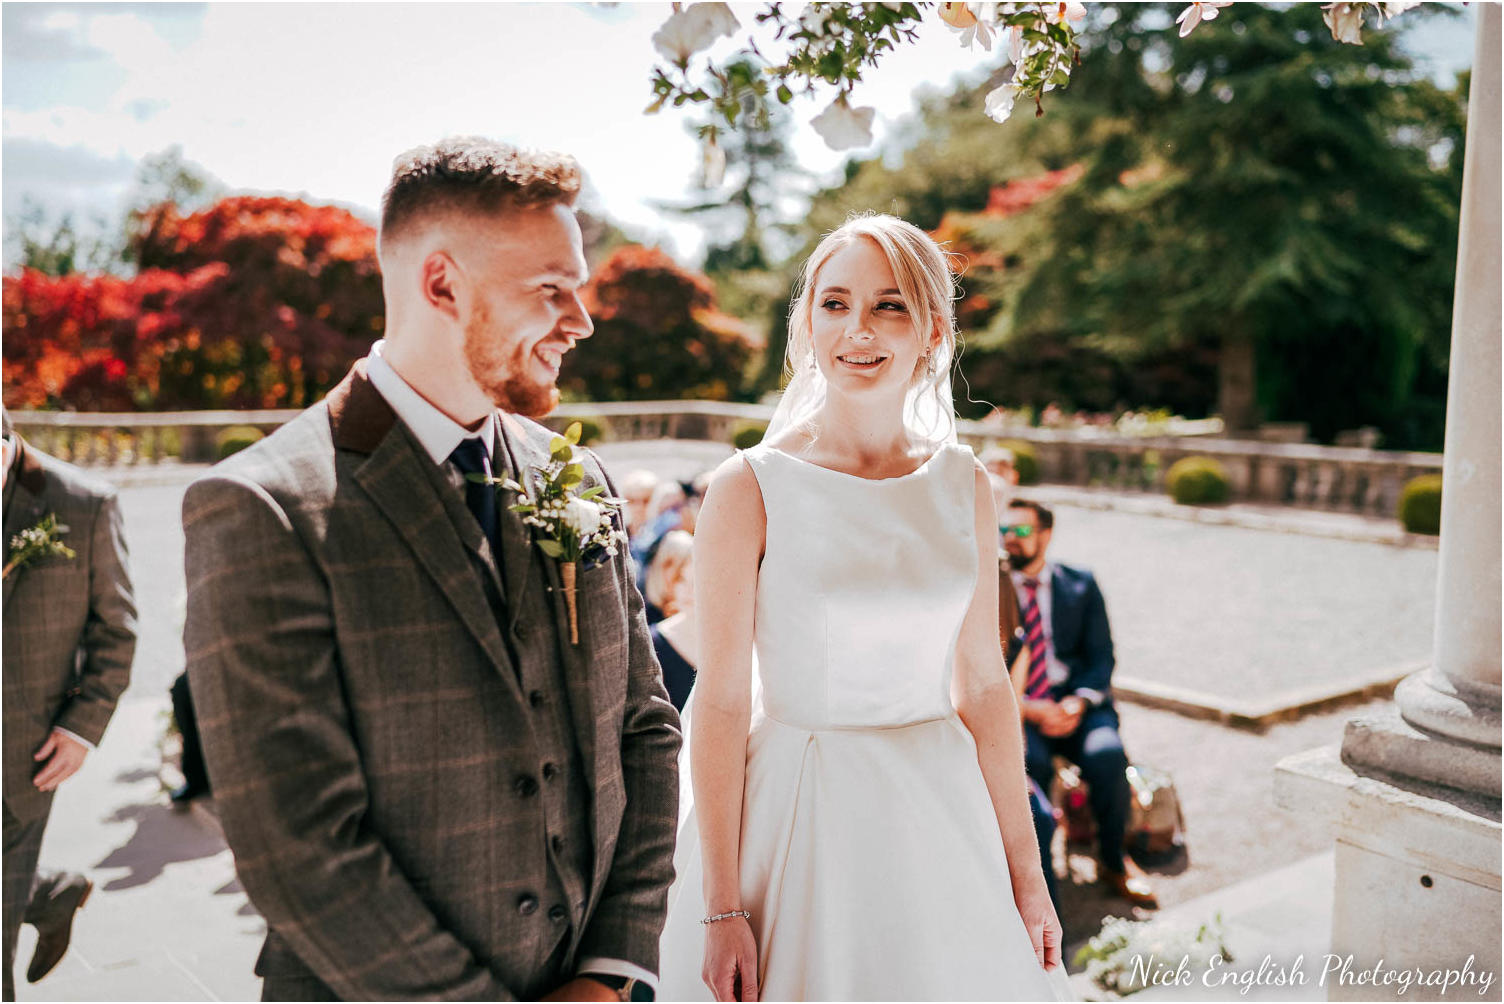 Eaves_Hall_Outdoor_Wedding_Photograph-33.jpg